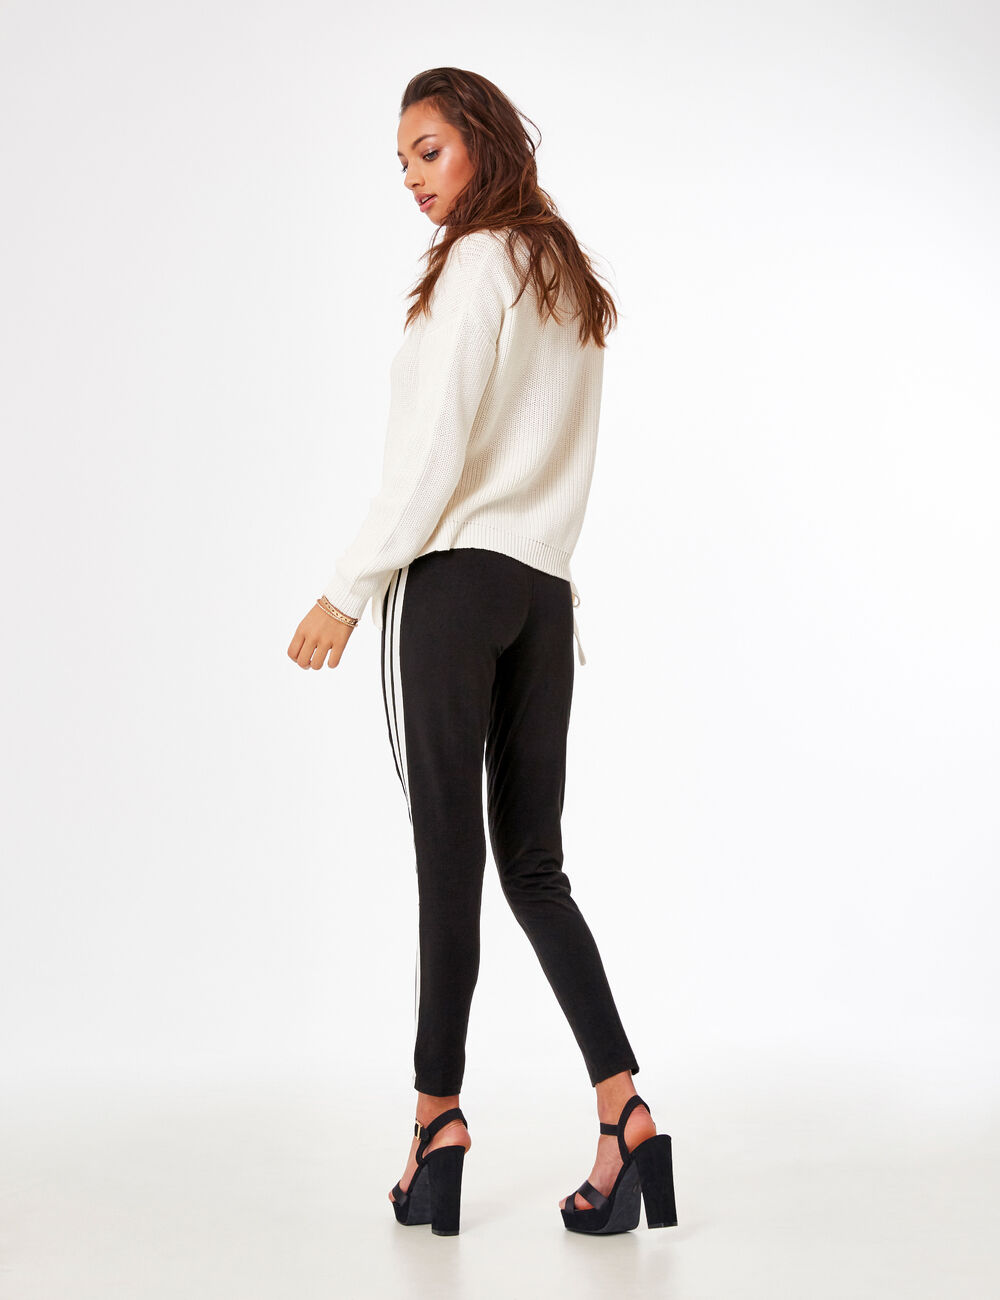 legging avec rayures c t s noir et blanc femme jennyfer. Black Bedroom Furniture Sets. Home Design Ideas